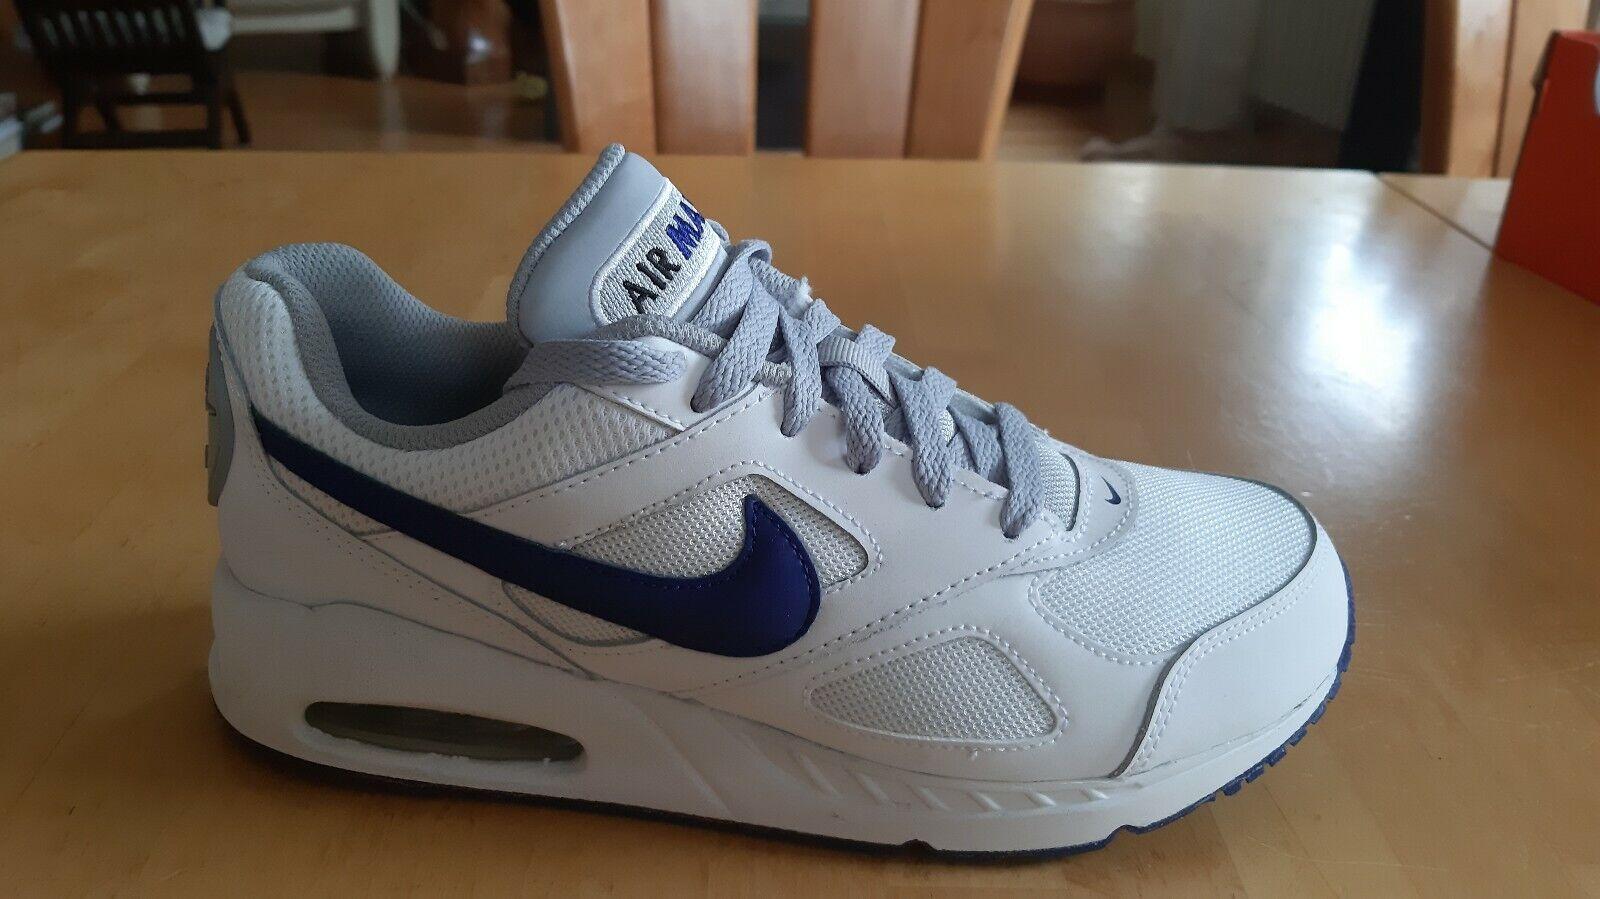 Nike Air Max Ivo (GS)  Weiß   Royal Blau Gr 38 UK 5 Turnschuhe NEU mit Karton